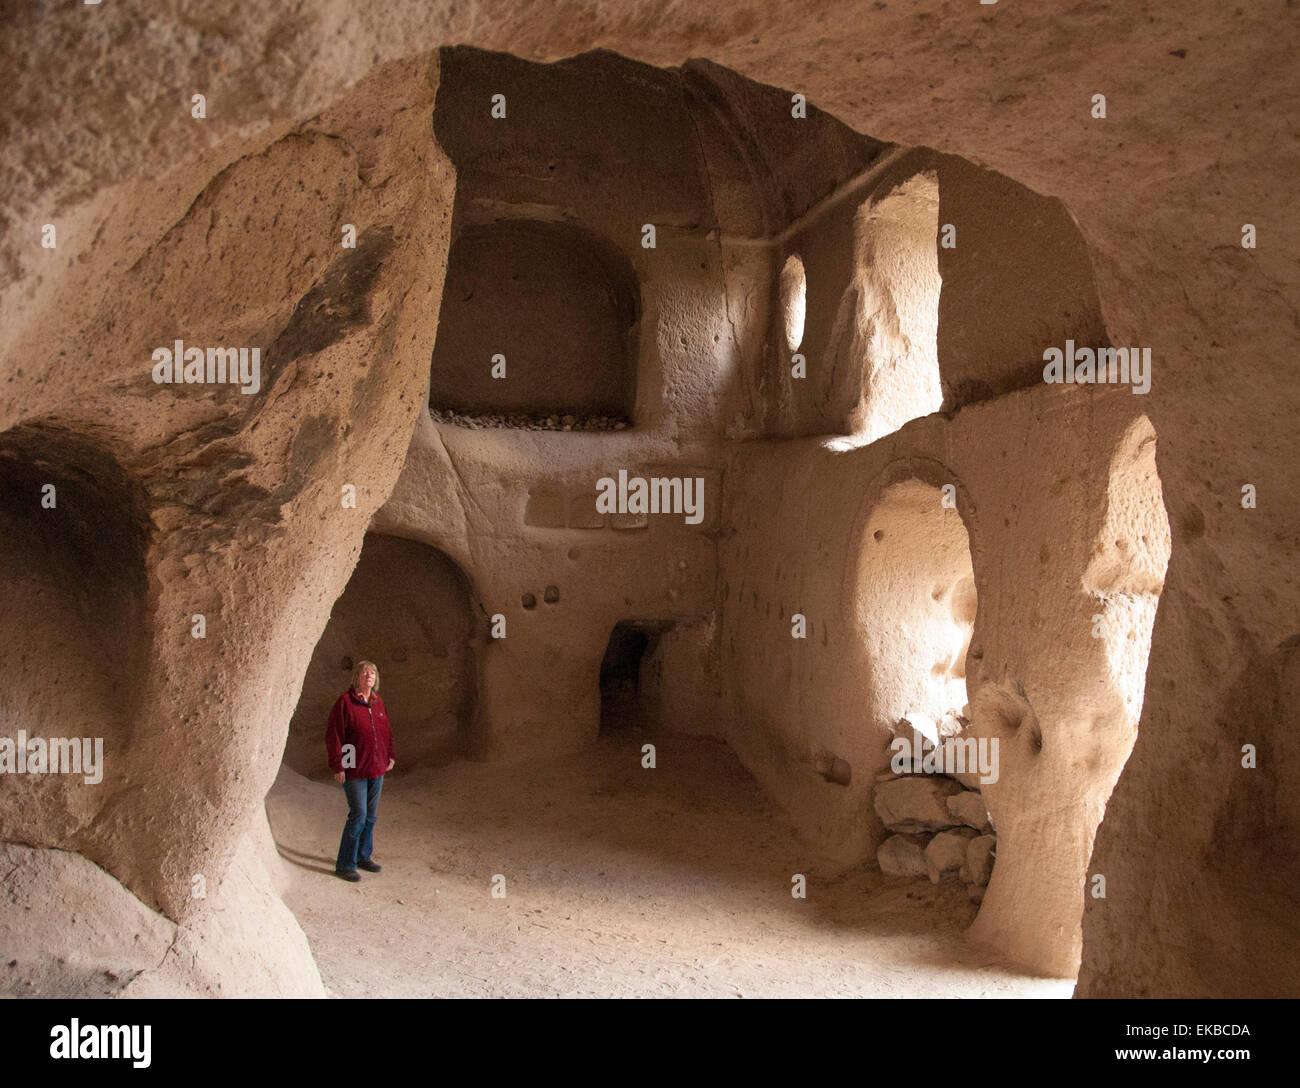 Iglesia Direkli, AD1000, Belisirma, Ihlara, Capadocia, Anatolia occidental, Turquía, Asia Menor, Eurasia Imagen De Stock